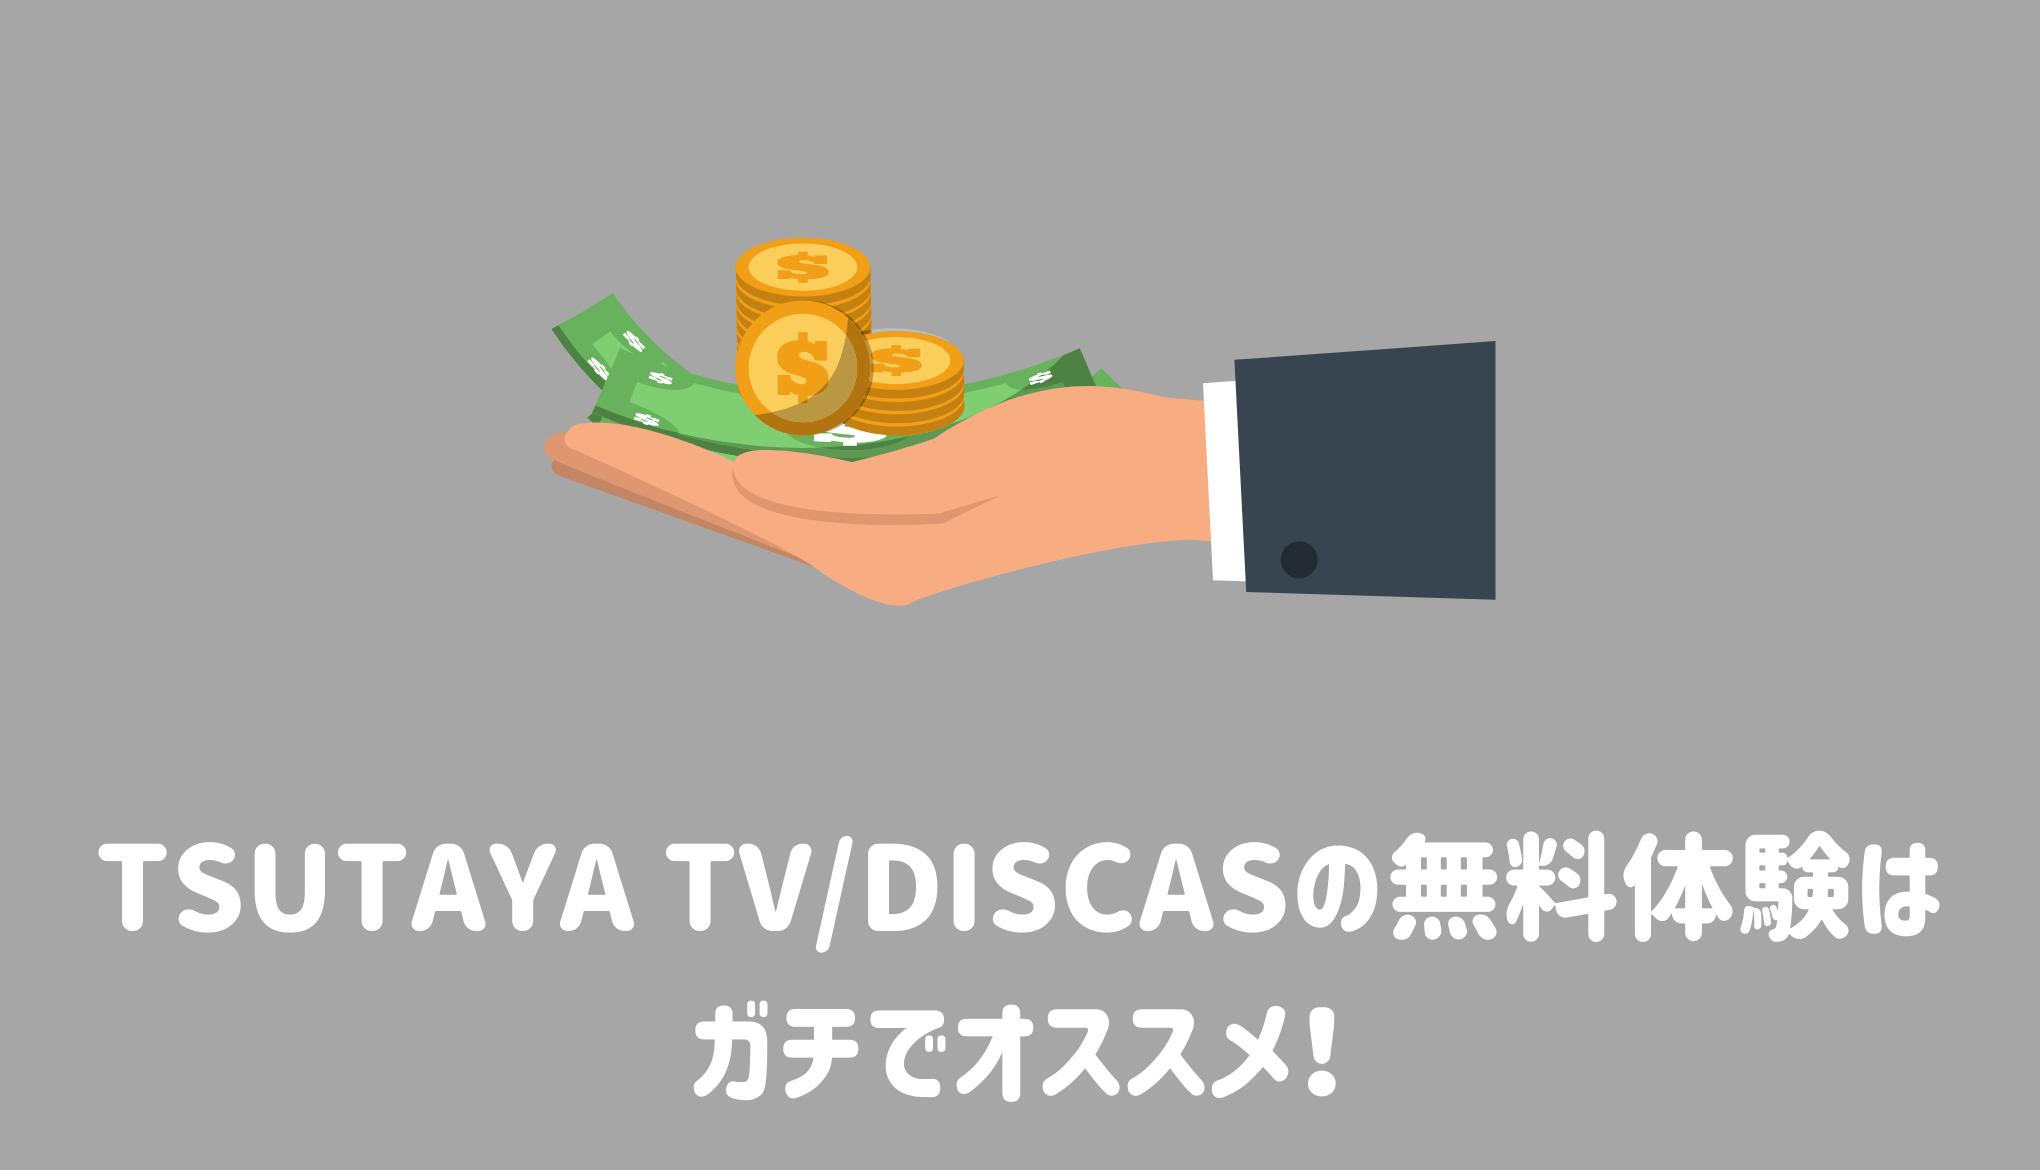 TSUTAYA TVとTSUTAYA DISCASの無料体験はガチでオススメ!